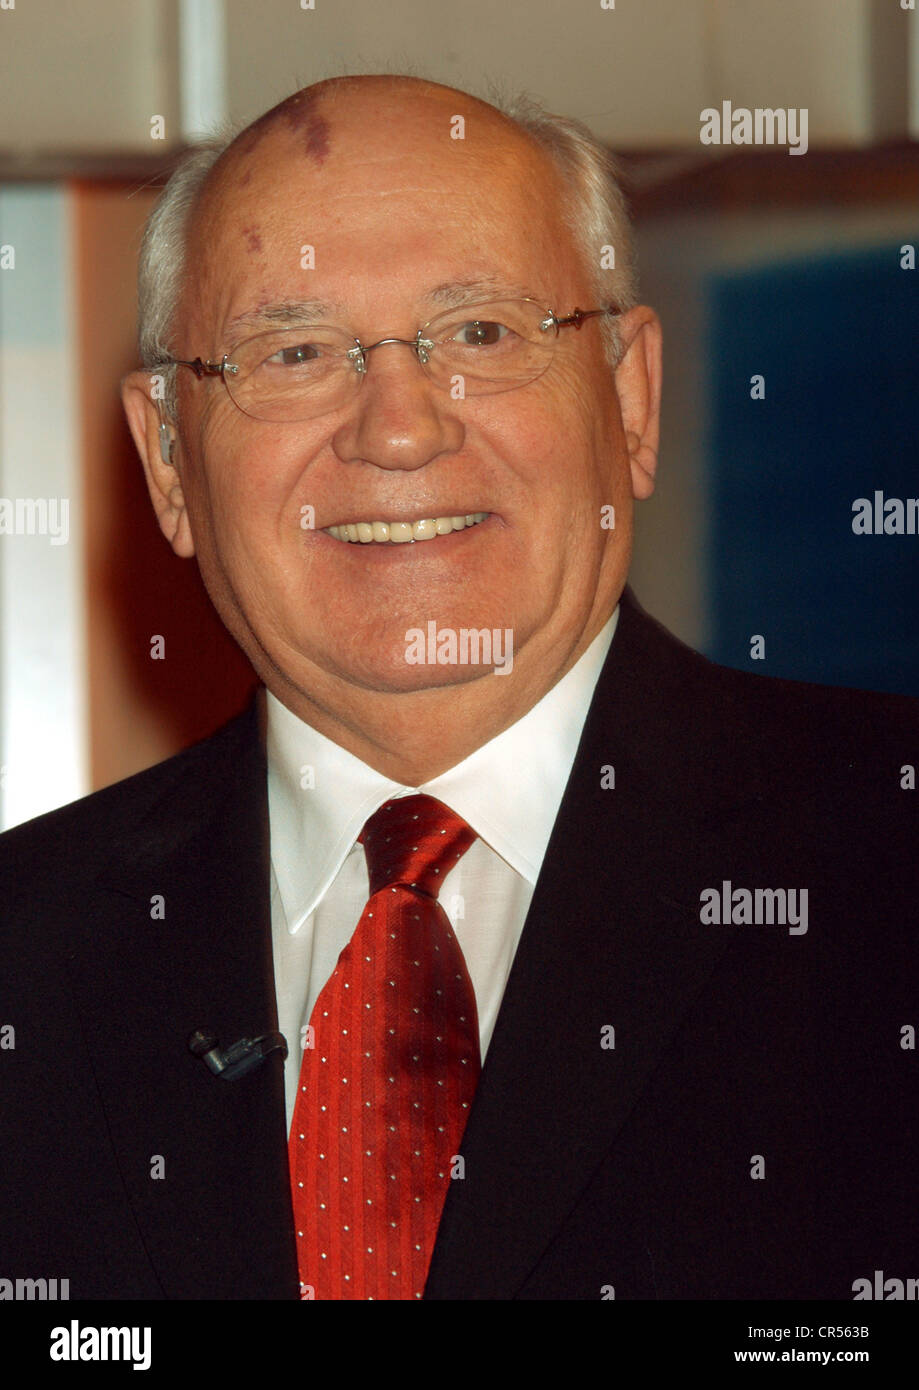 Gorbachev, Mikhail, * 2.3.1931, Soviet politician (KPdSU), portrait, 2003, Additional-Rights-Clearances-NA - Stock Image